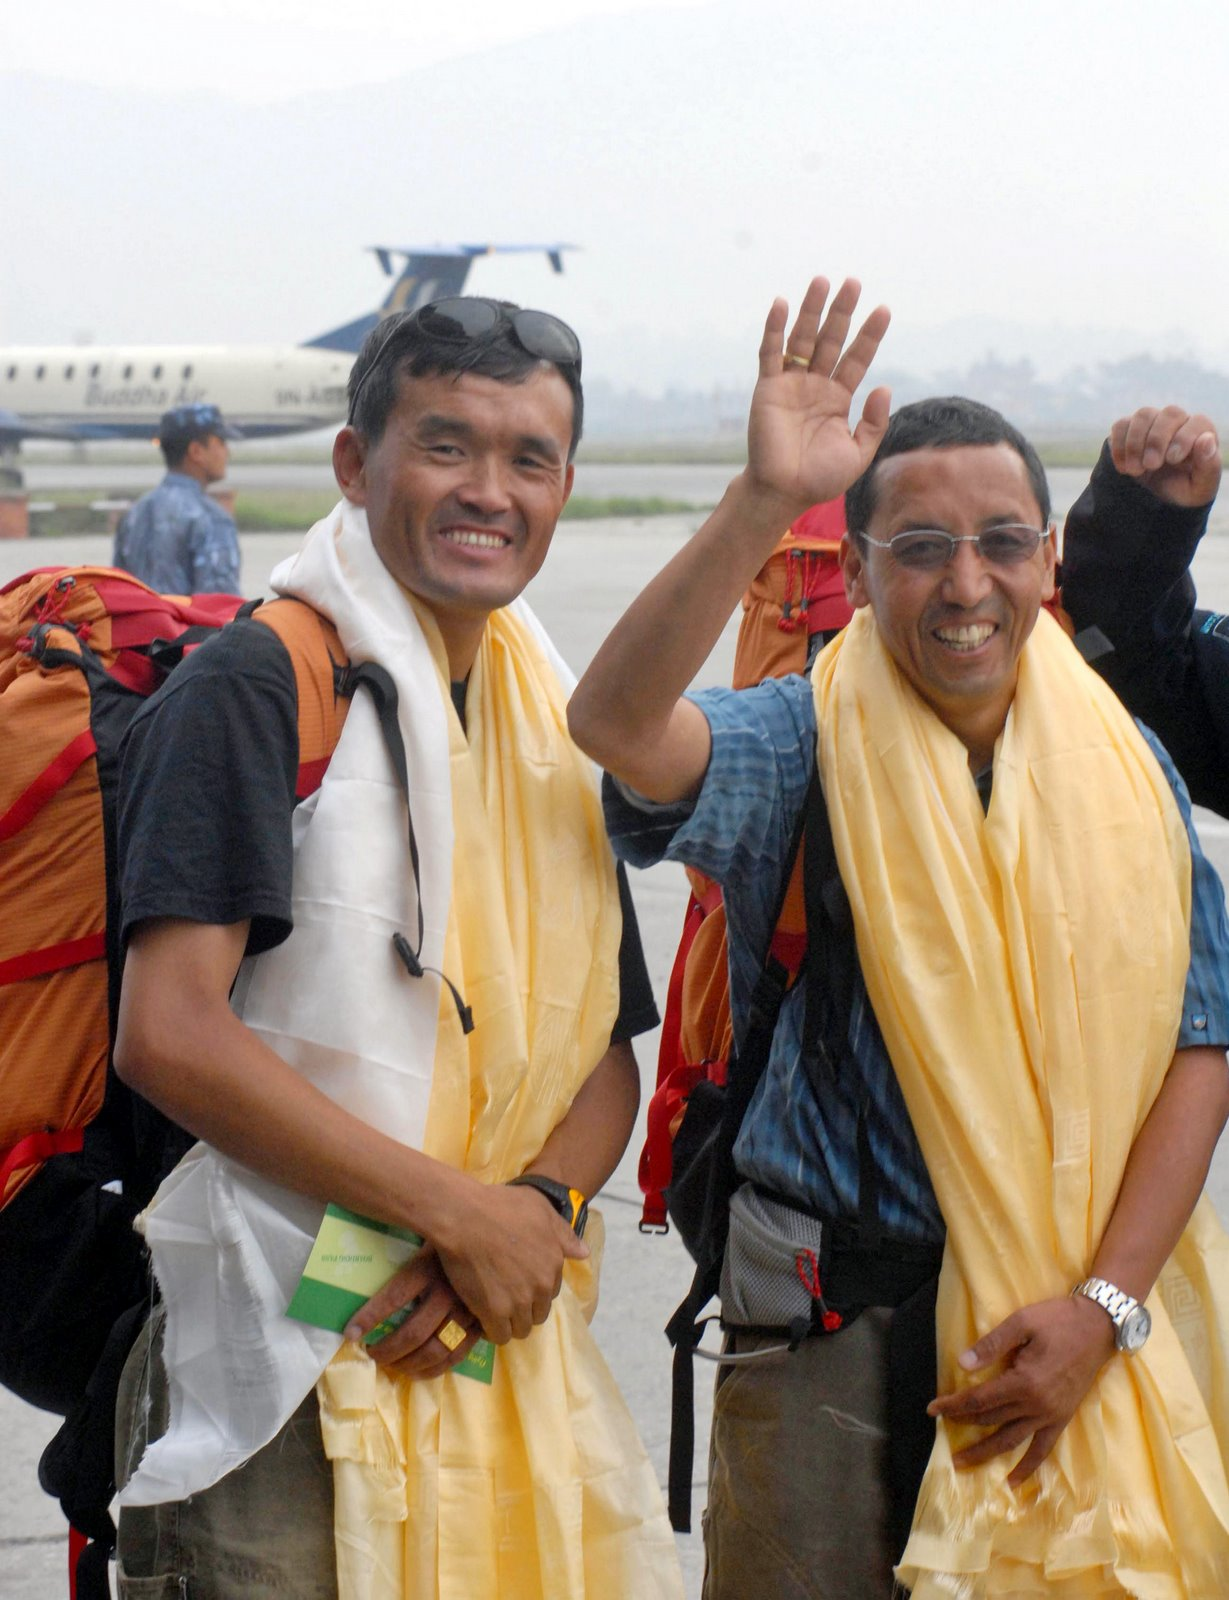 [KAT101_Nepal_Everest_Nepal.jpg+]